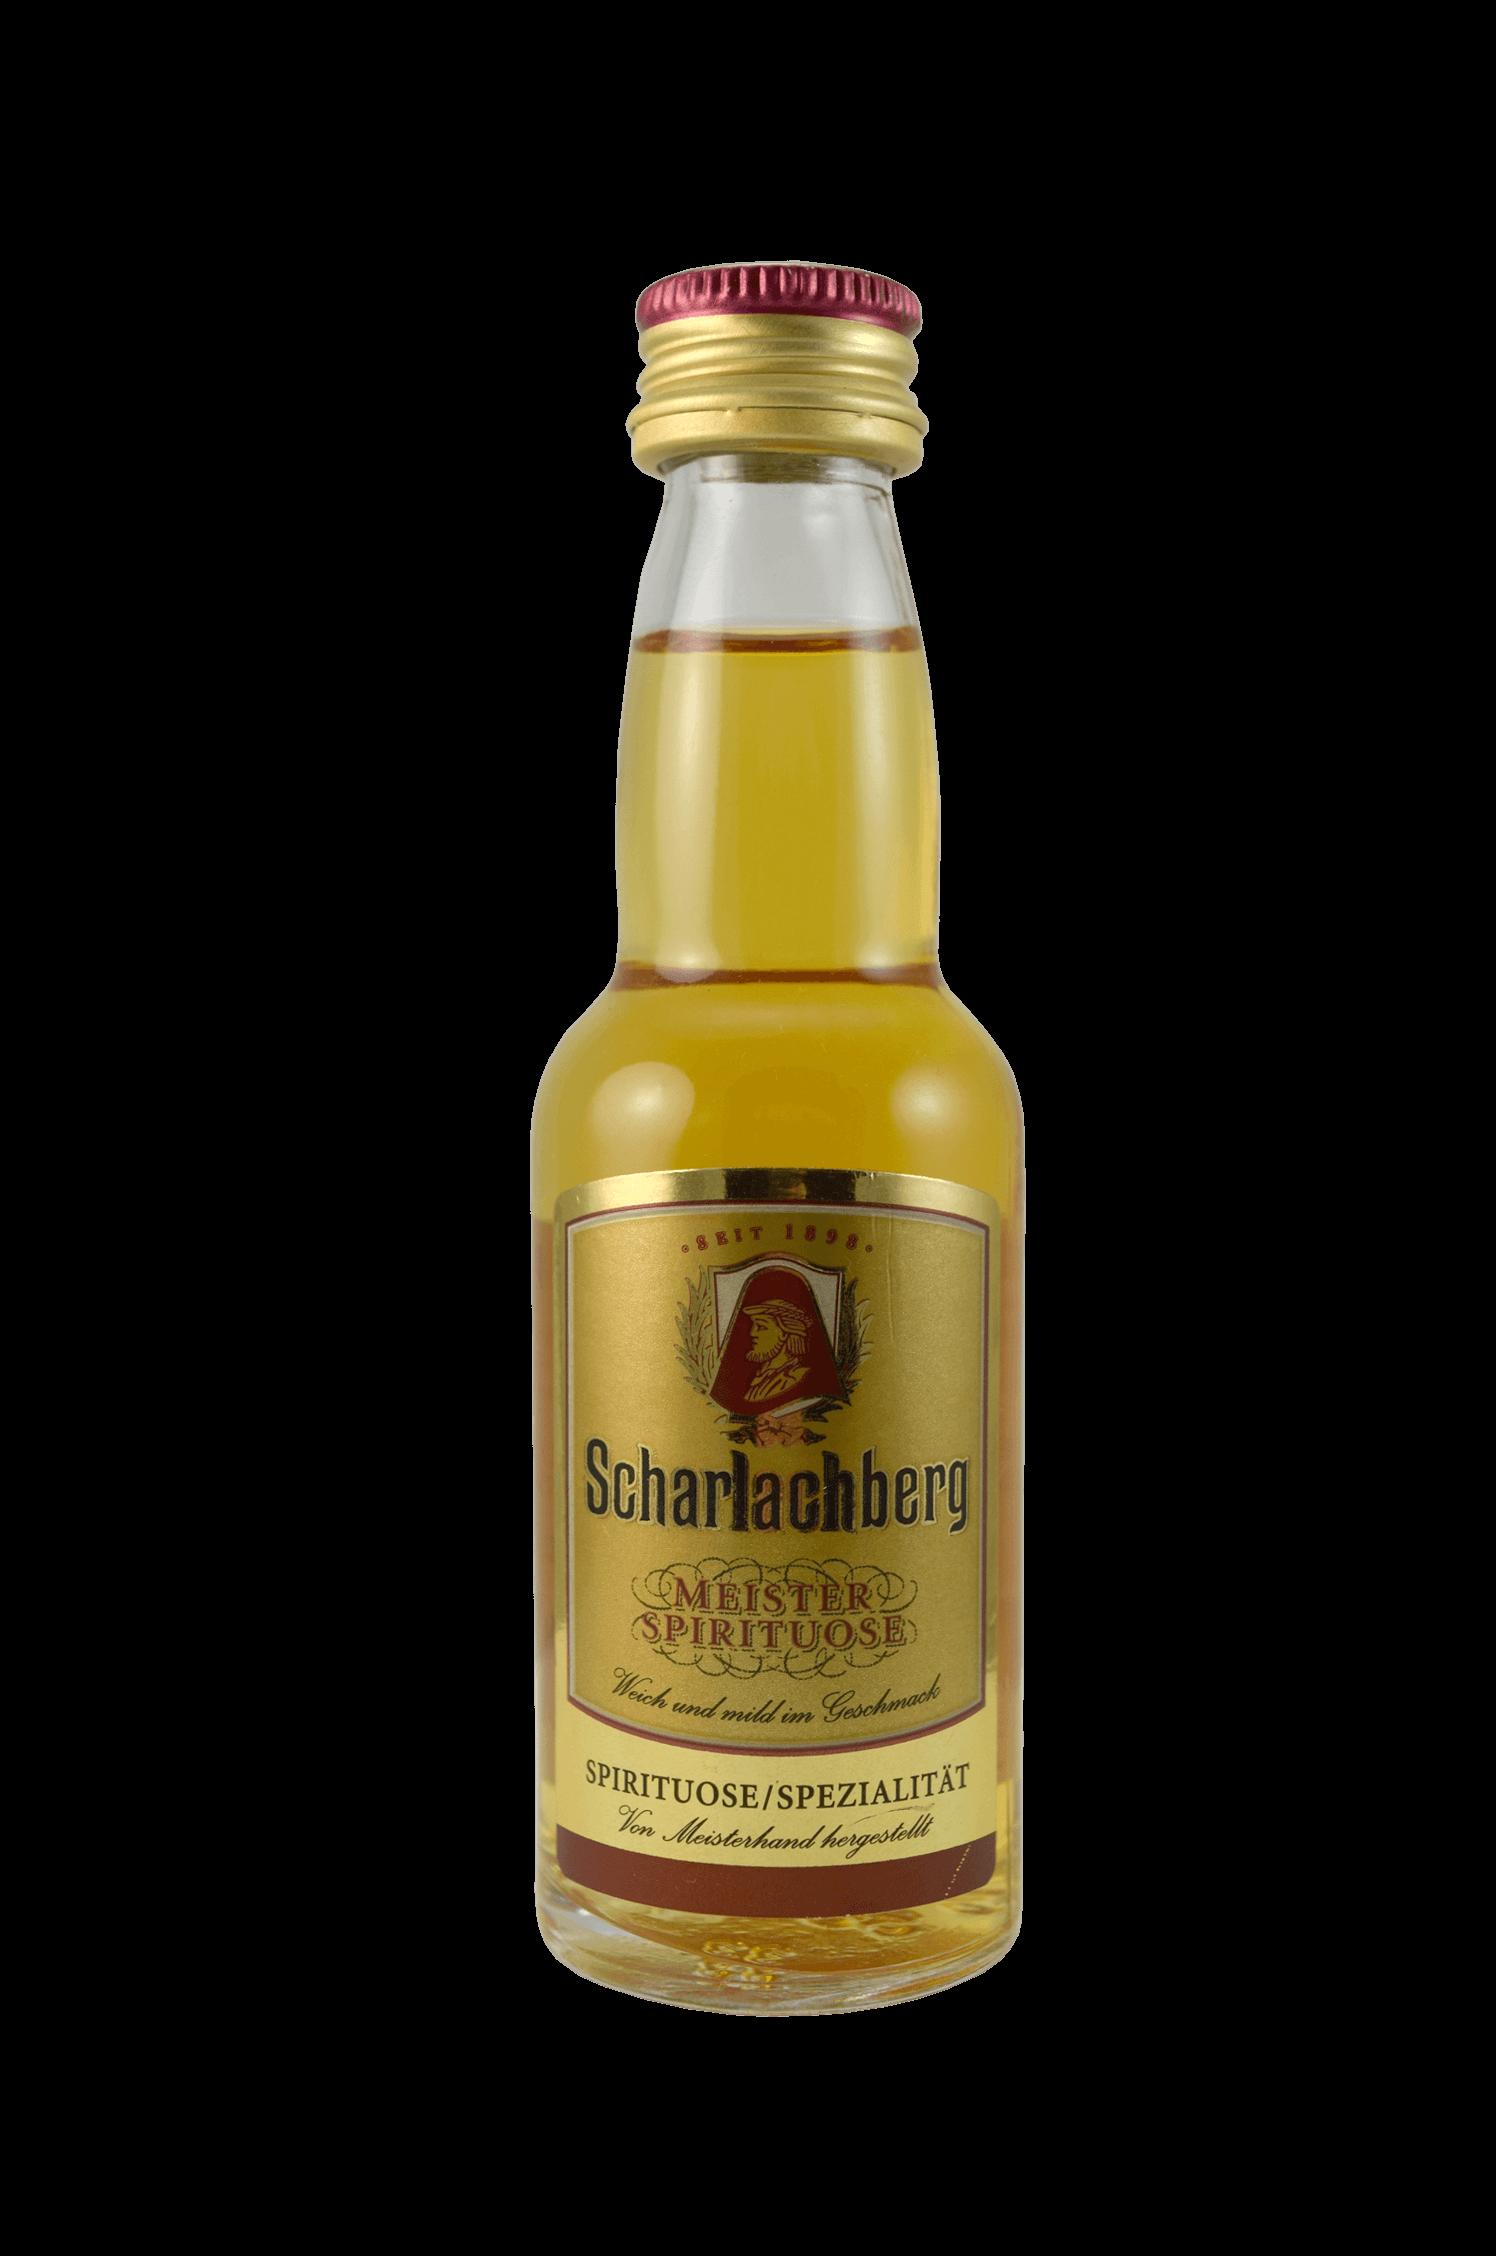 Scharlachberg Meister Spirituose